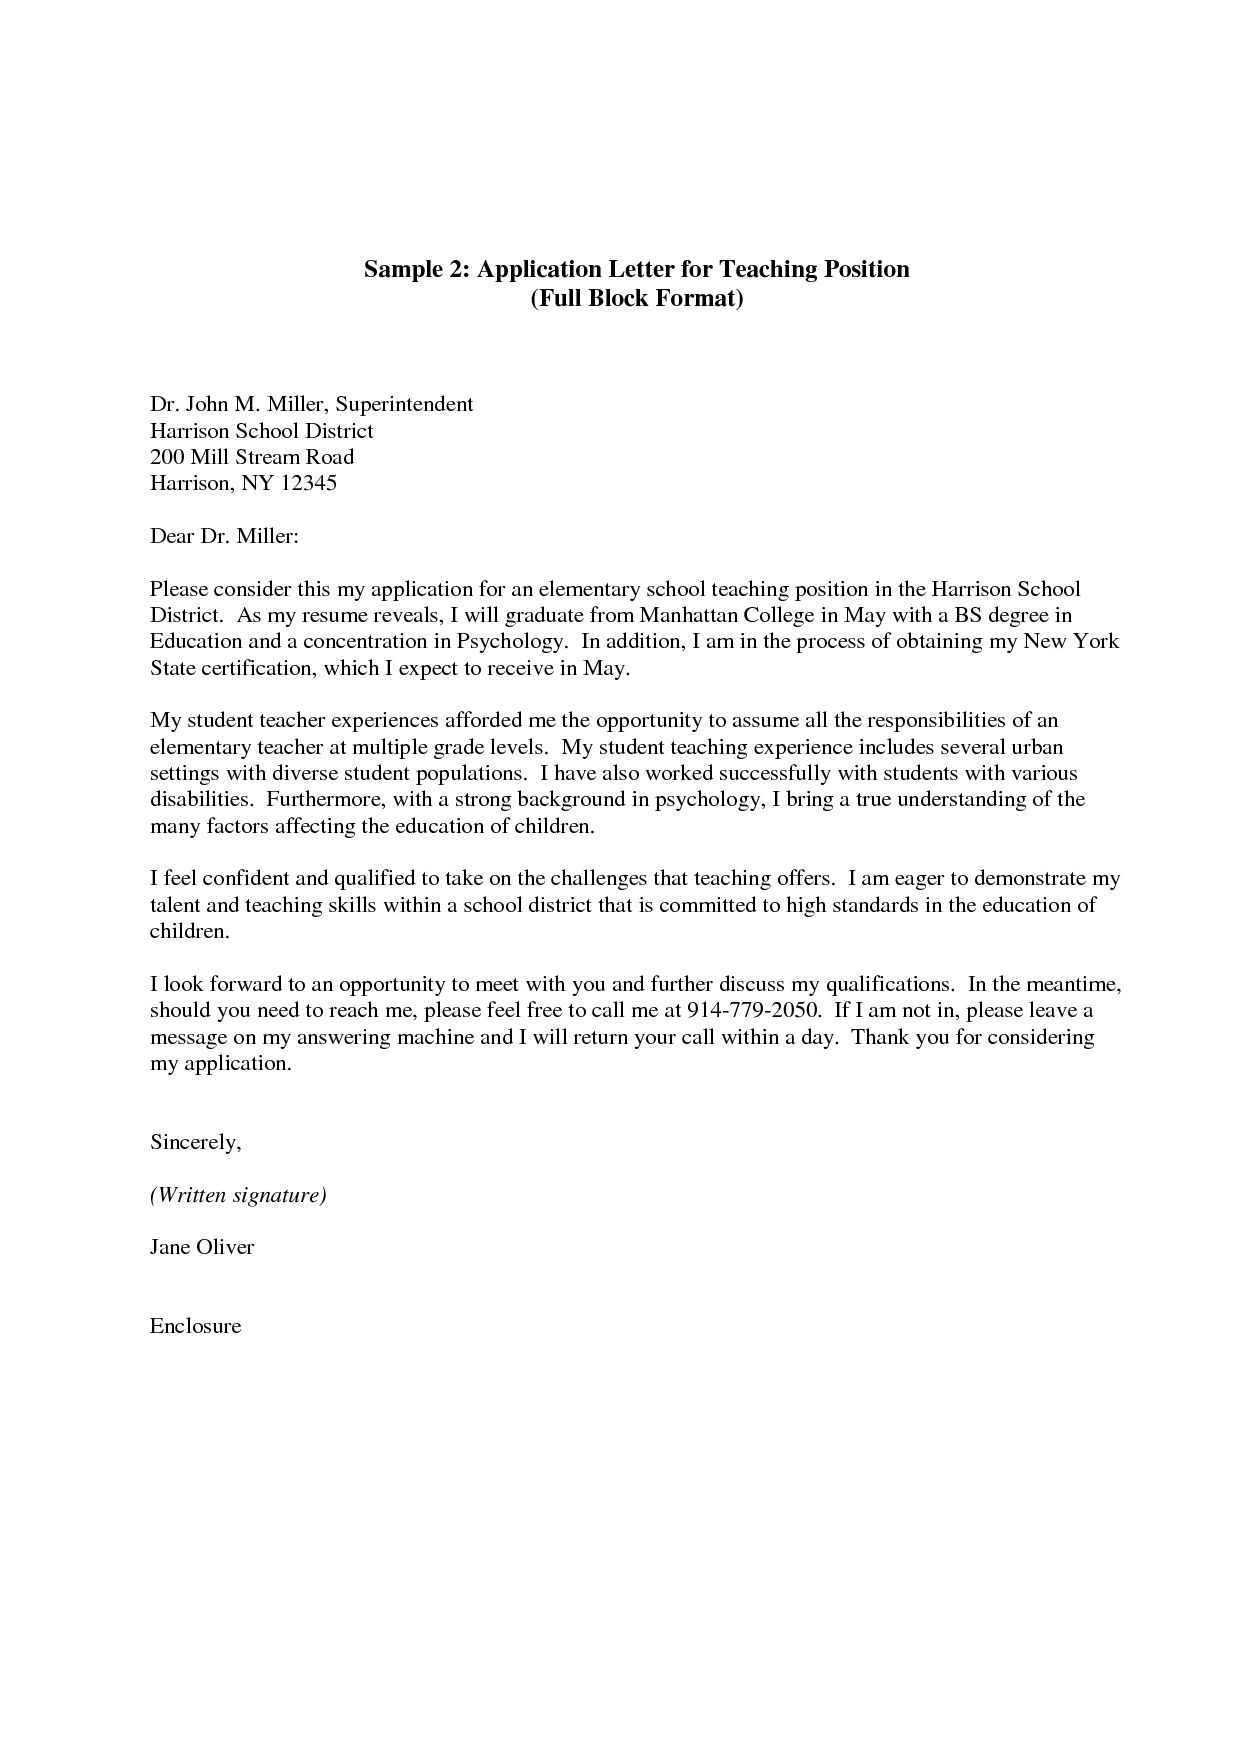 Cover Letter Worksheet For High School Students